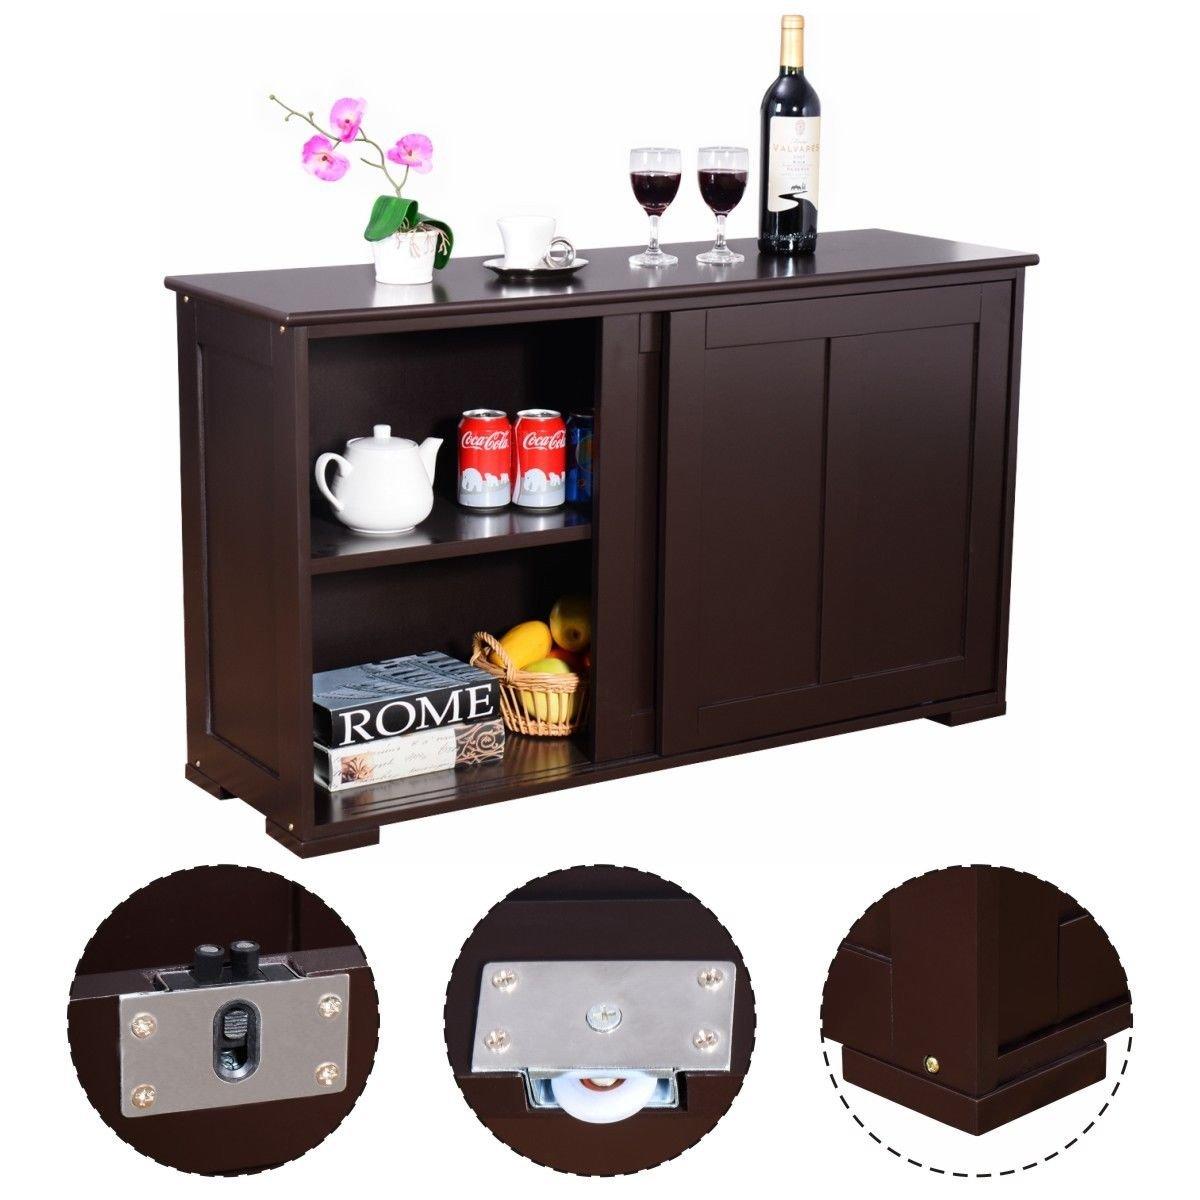 New MTN-G Kitchen Storage Cabinet Sideboard Buffet Cupboard Wood Sliding Door Pantry by MTN Gearsmith